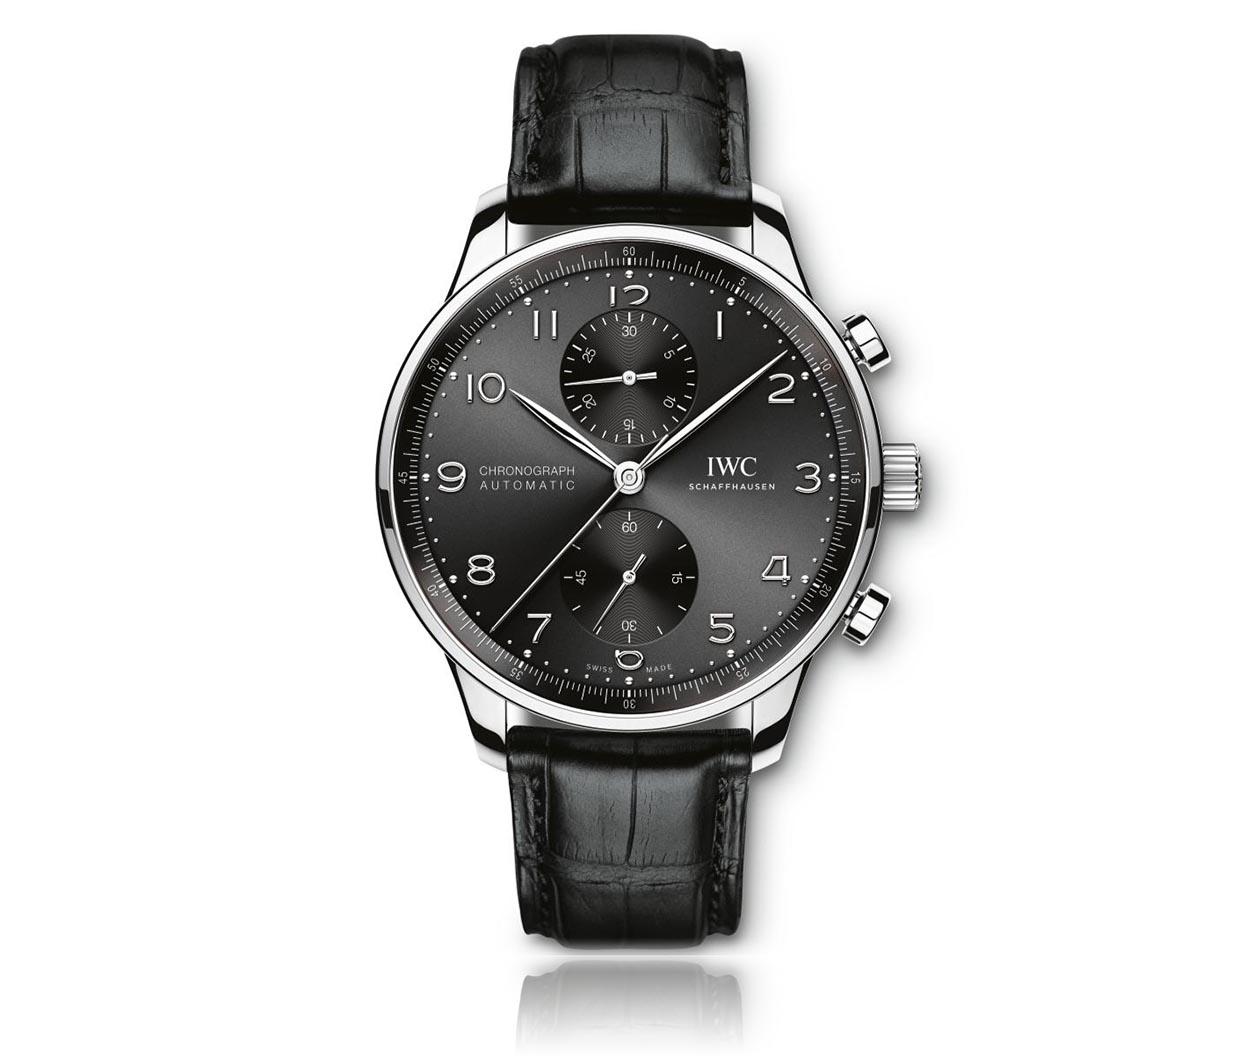 IWC Portugieser Chronograph IW371609 Carousel 1 FINAL